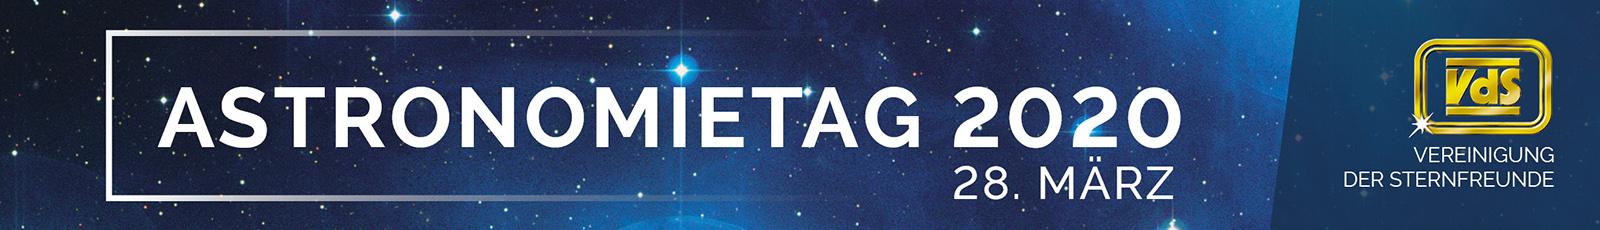 Astronomietag 2020 Banner schmal